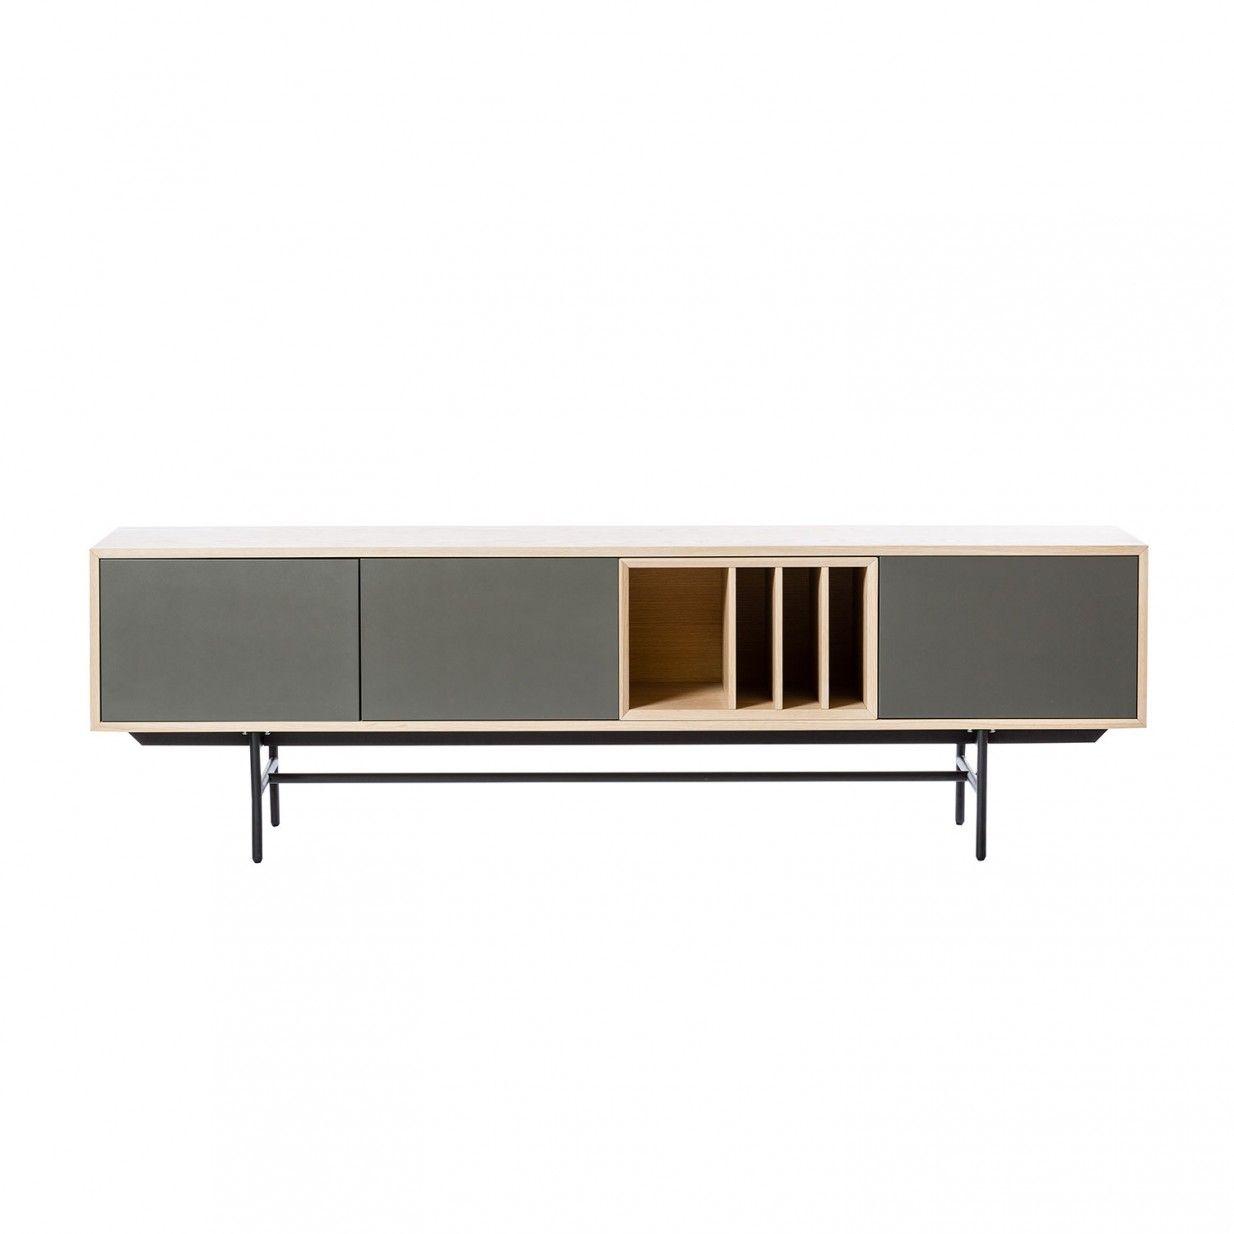 Valencia Sideboard A | UNICO Milano | Wohnung | Pinterest